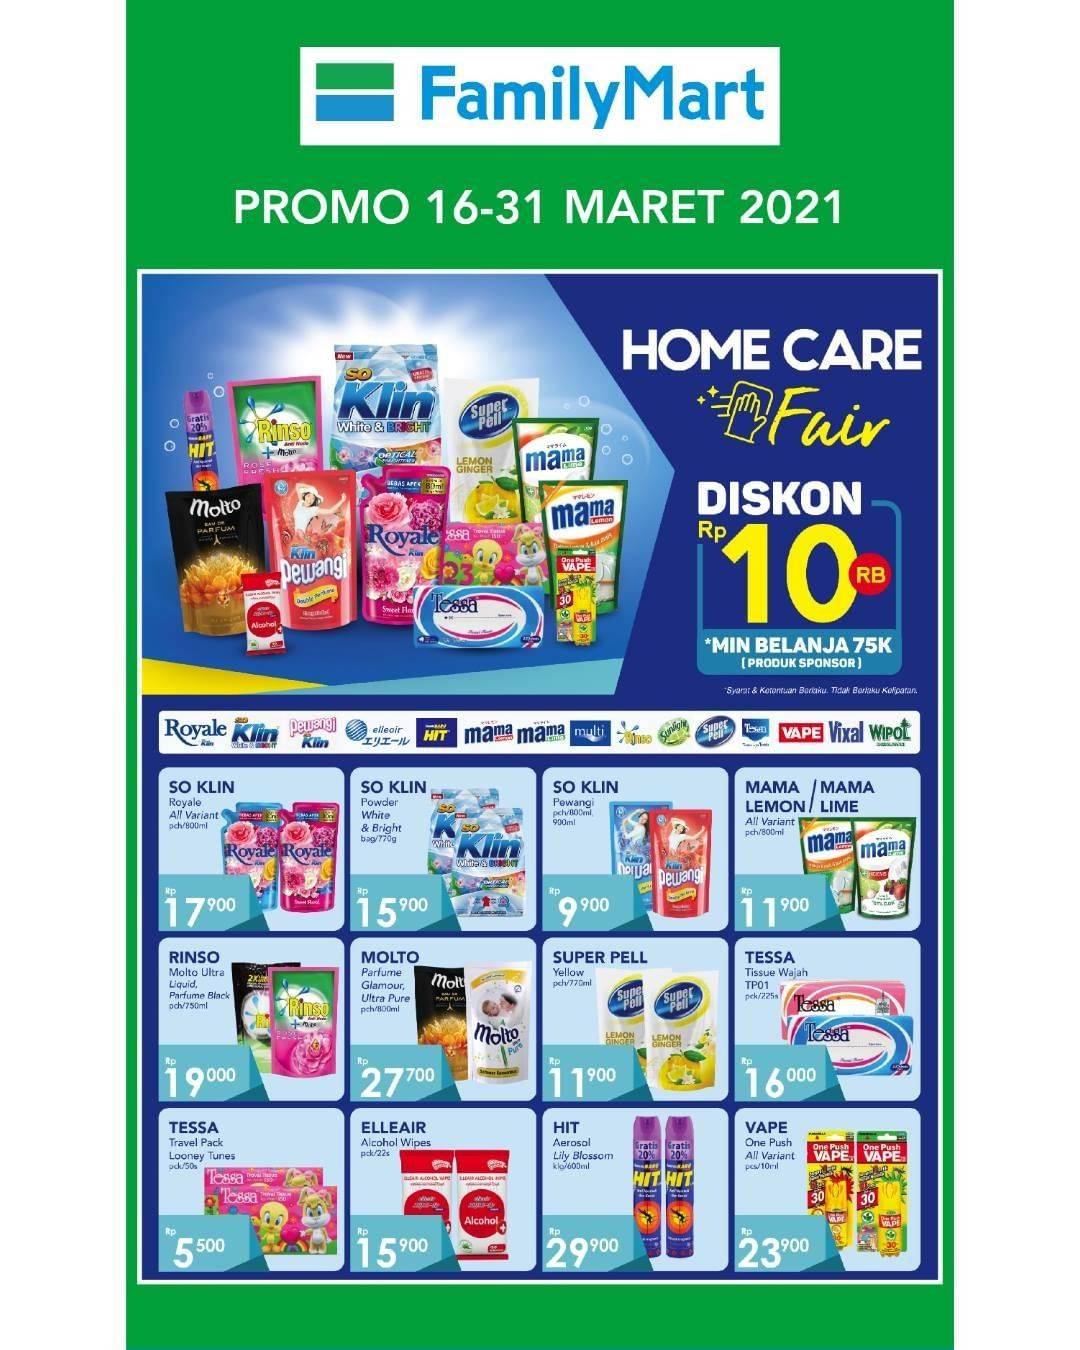 Diskon Katalog Promo Familymart Home Care Fair Periode 16 - 31 Maret 2021